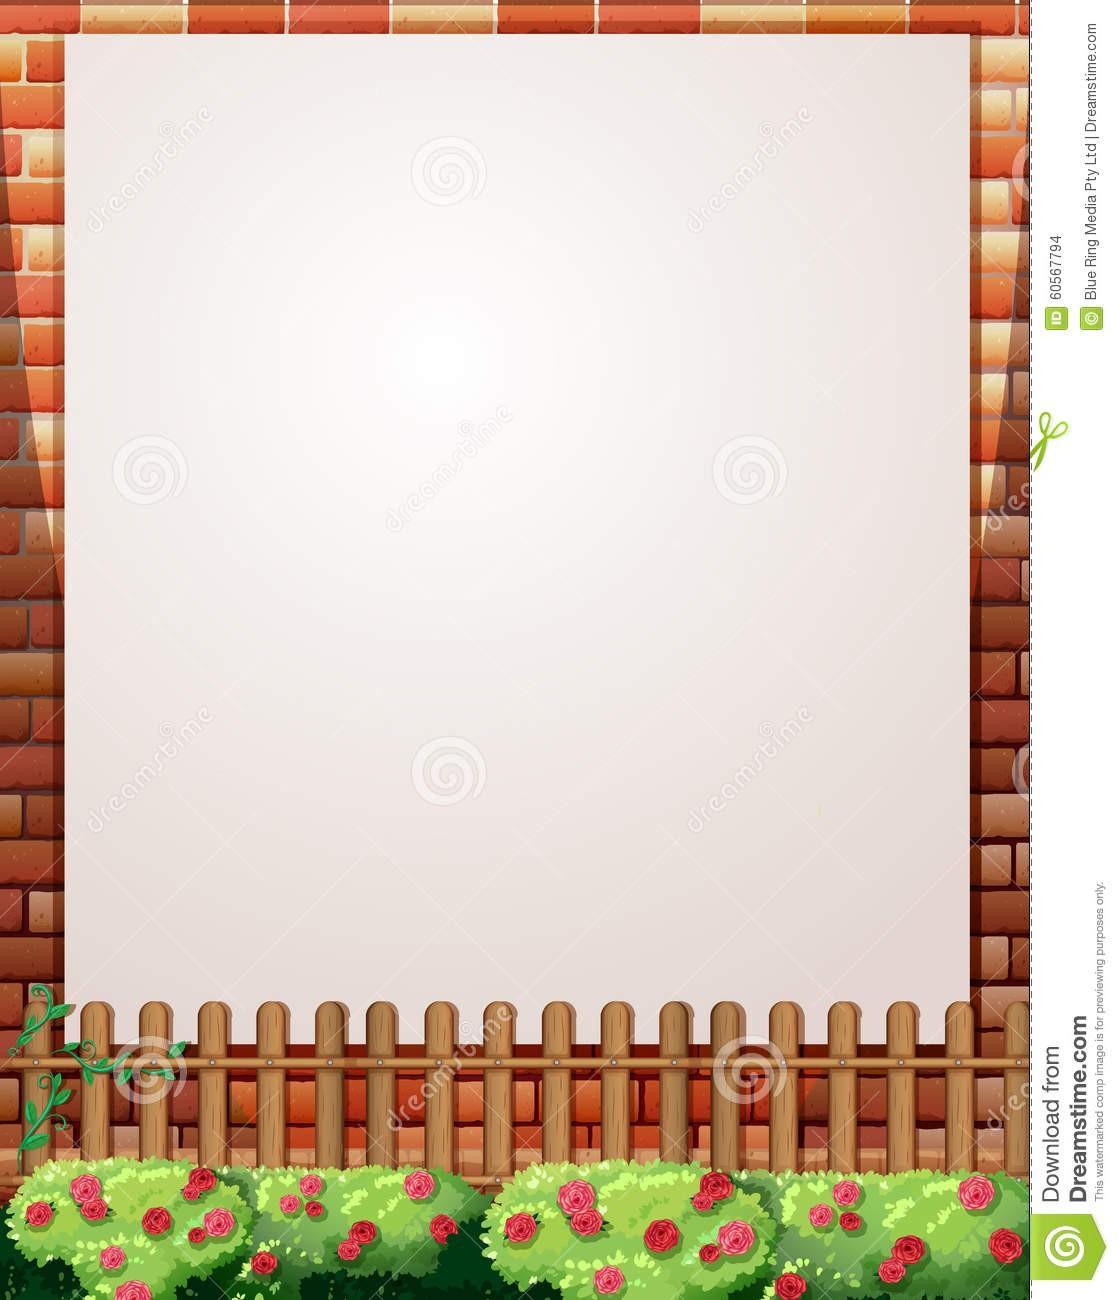 Design mincifine fr . Fence clipart border wall